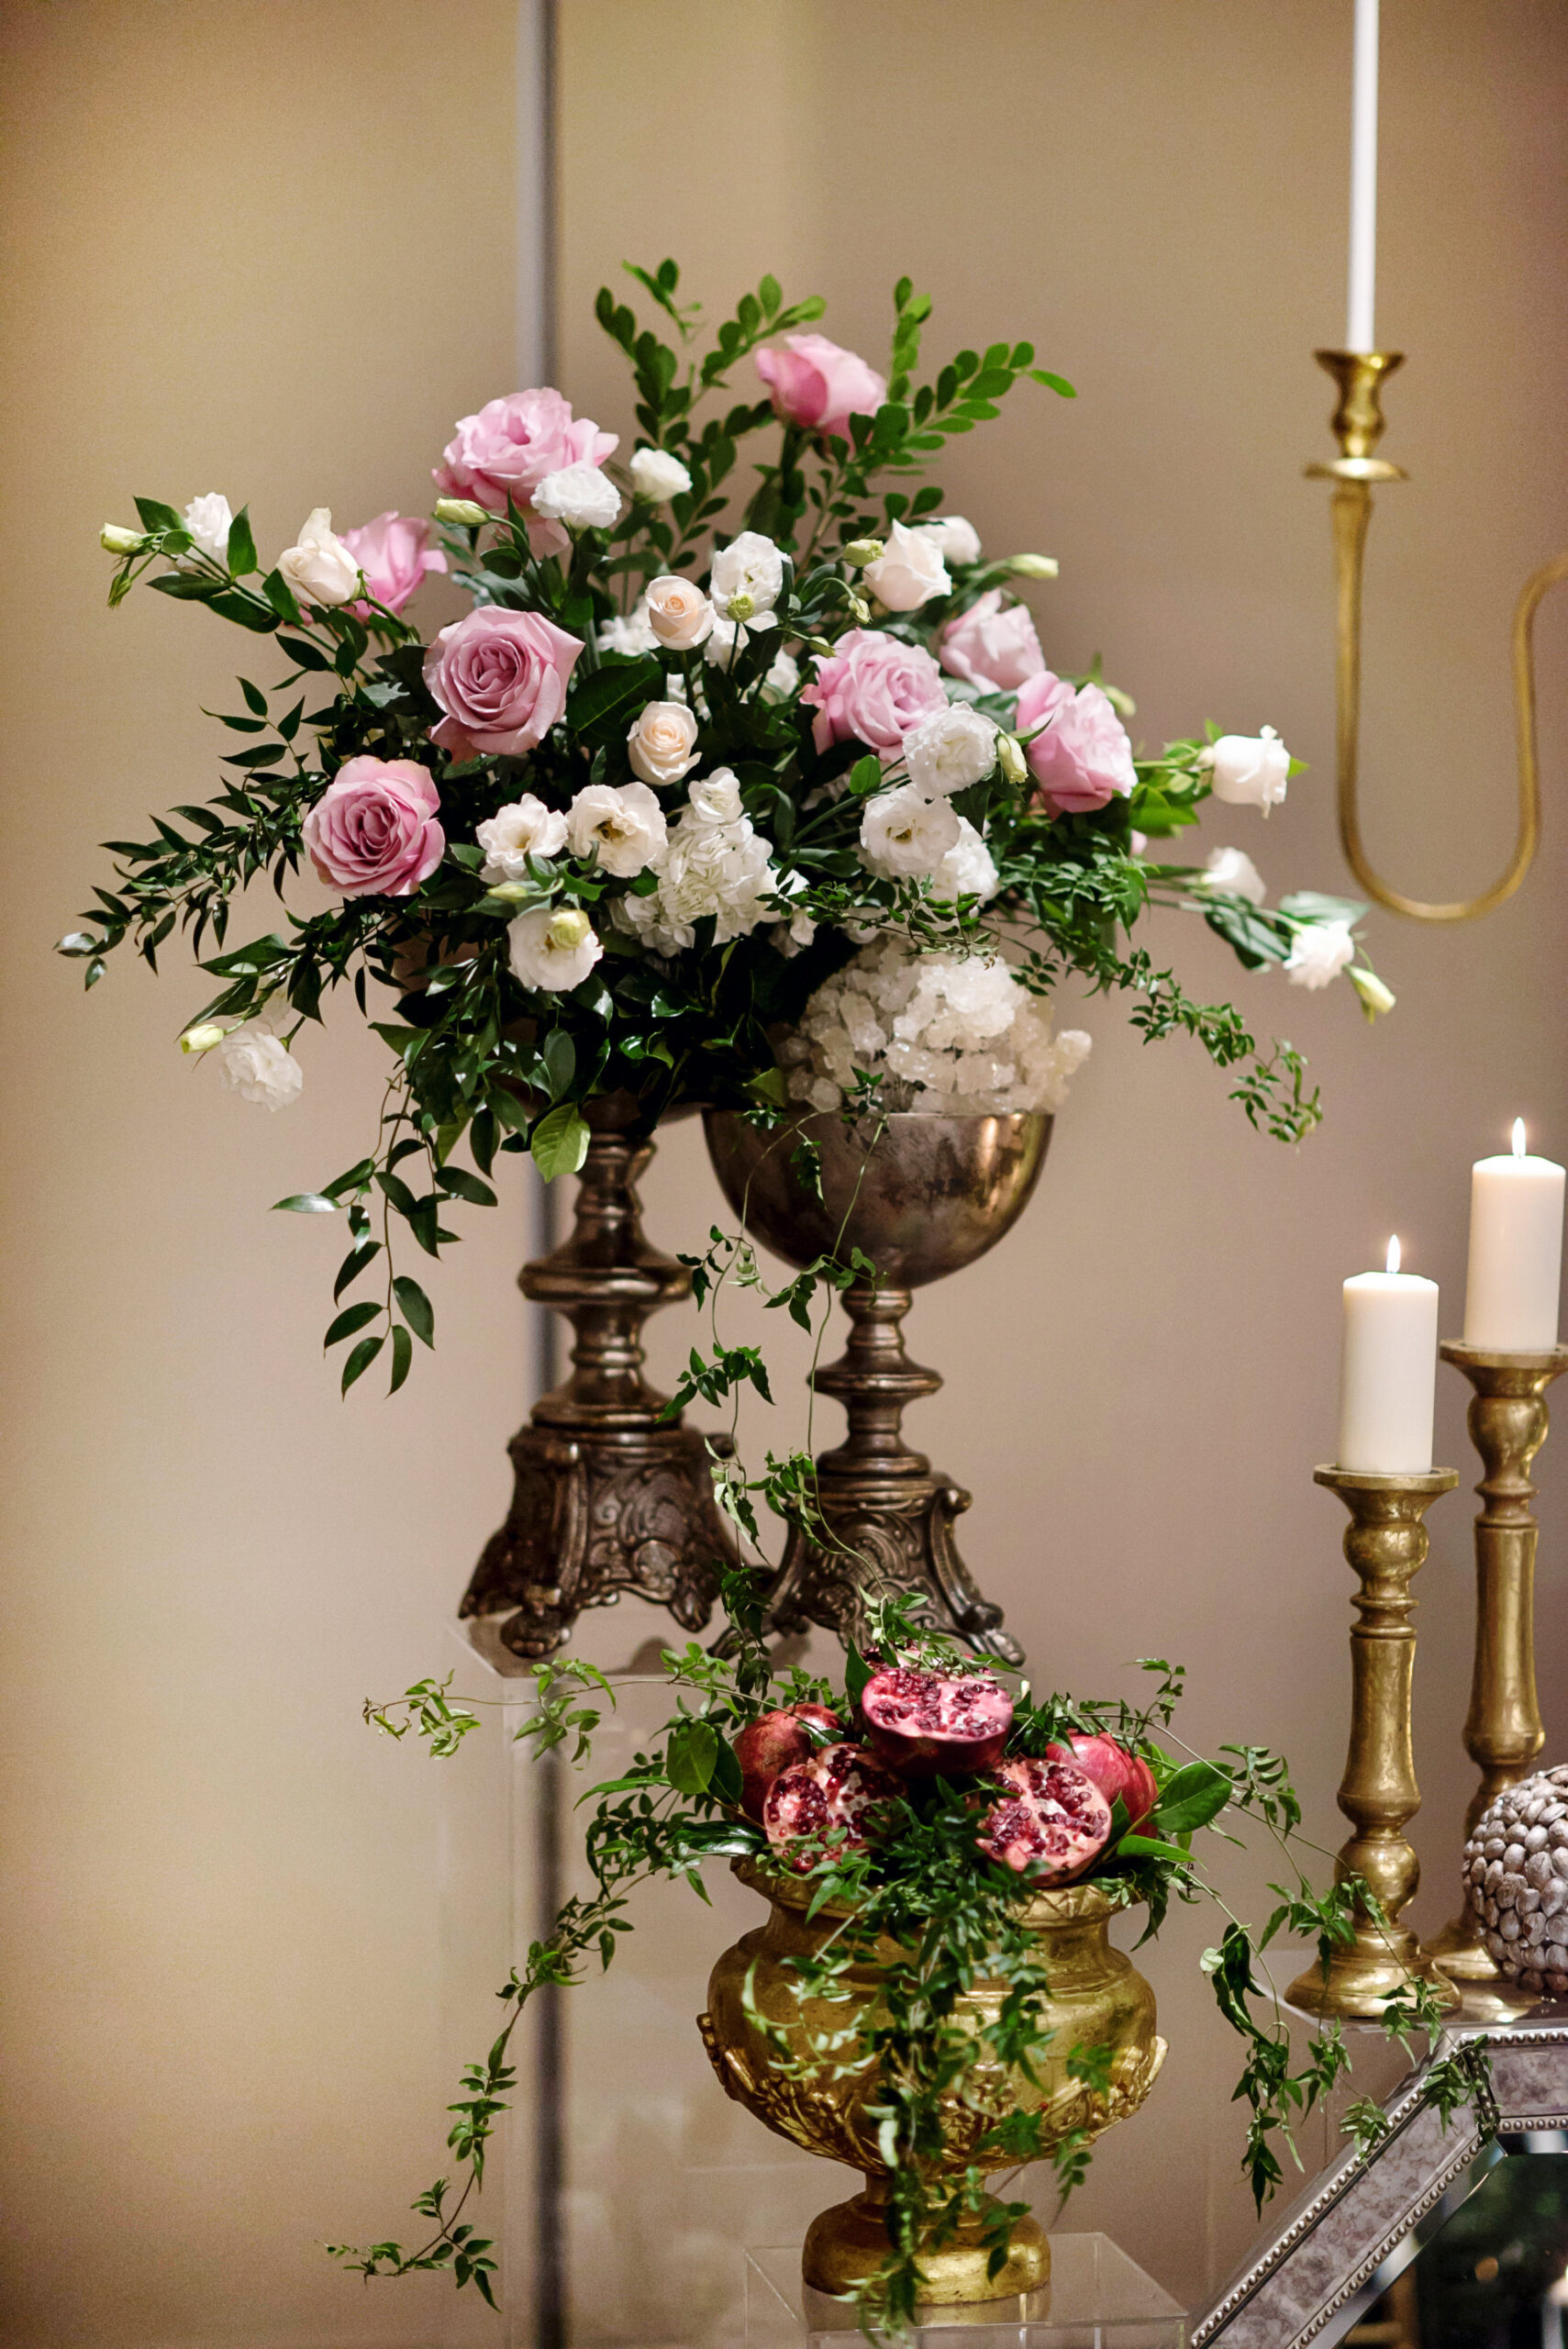 https://secureservercdn.net/45.40.145.151/kgq.ab5.myftpupload.com/wp-content/uploads/2020/04/Sanam-Soroush-s-Wedding-wedluxe-submission-0043-scaled.jpg?time=1606414923